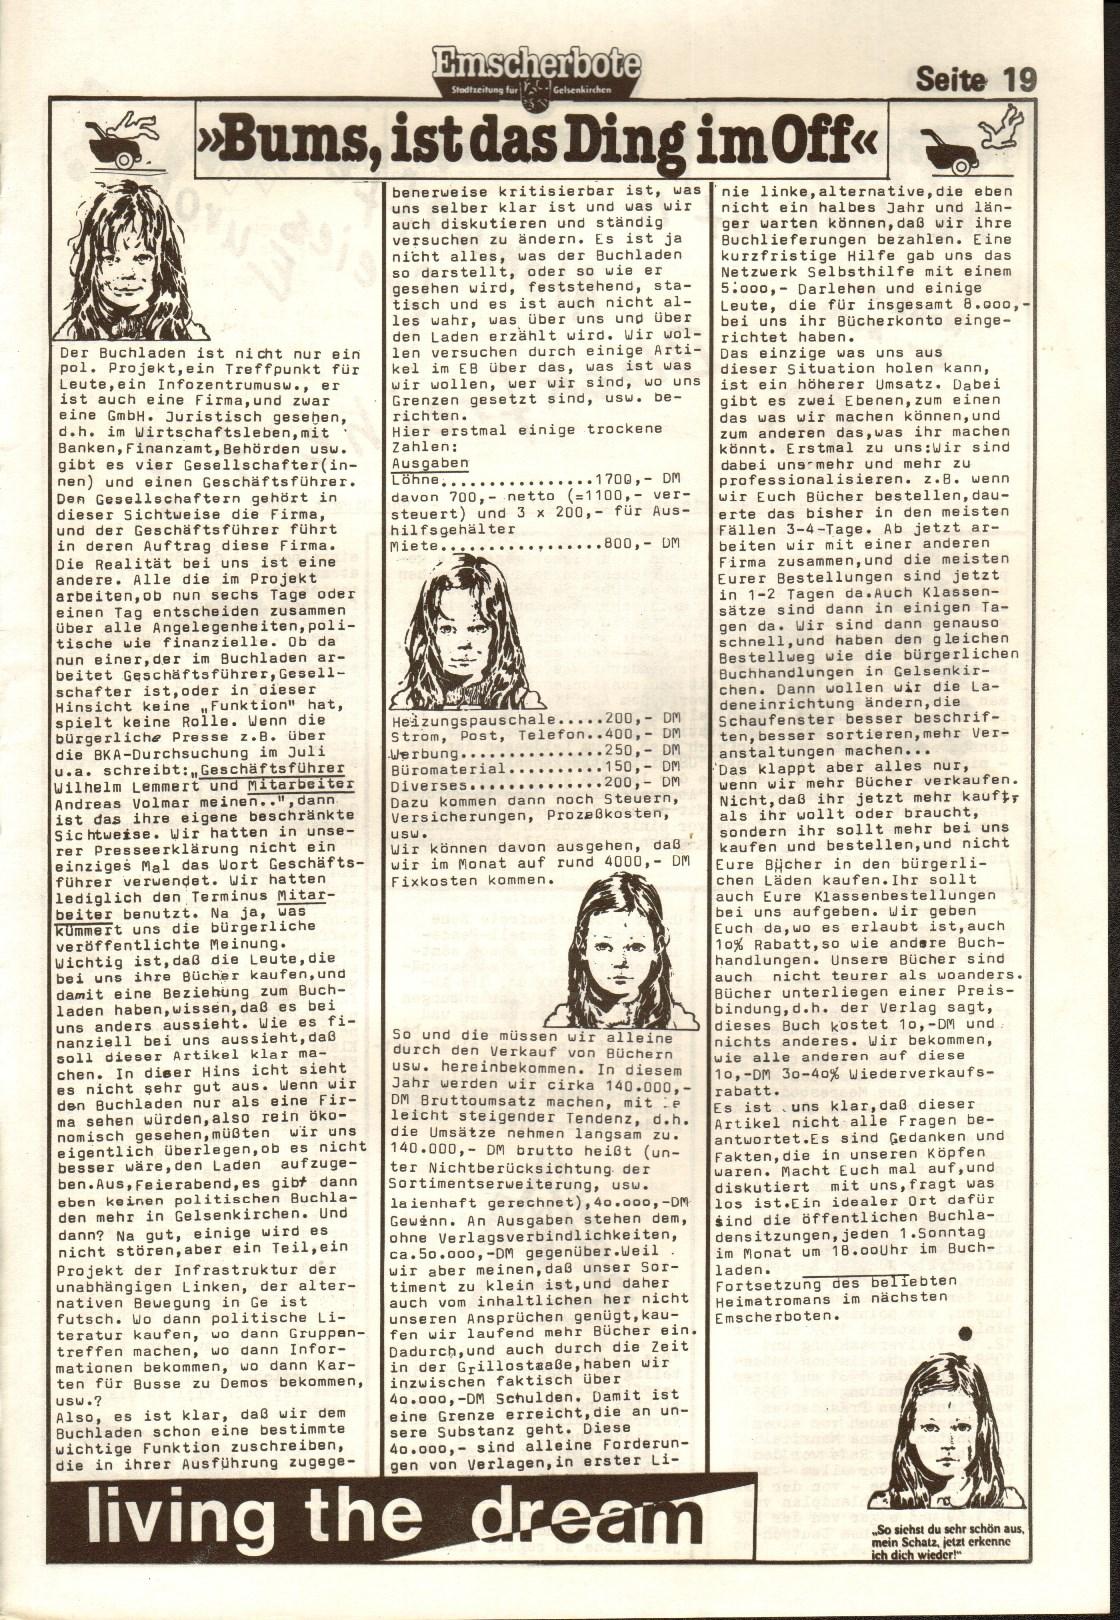 Gelsenkirchen_Emscherbote_1982_22_19